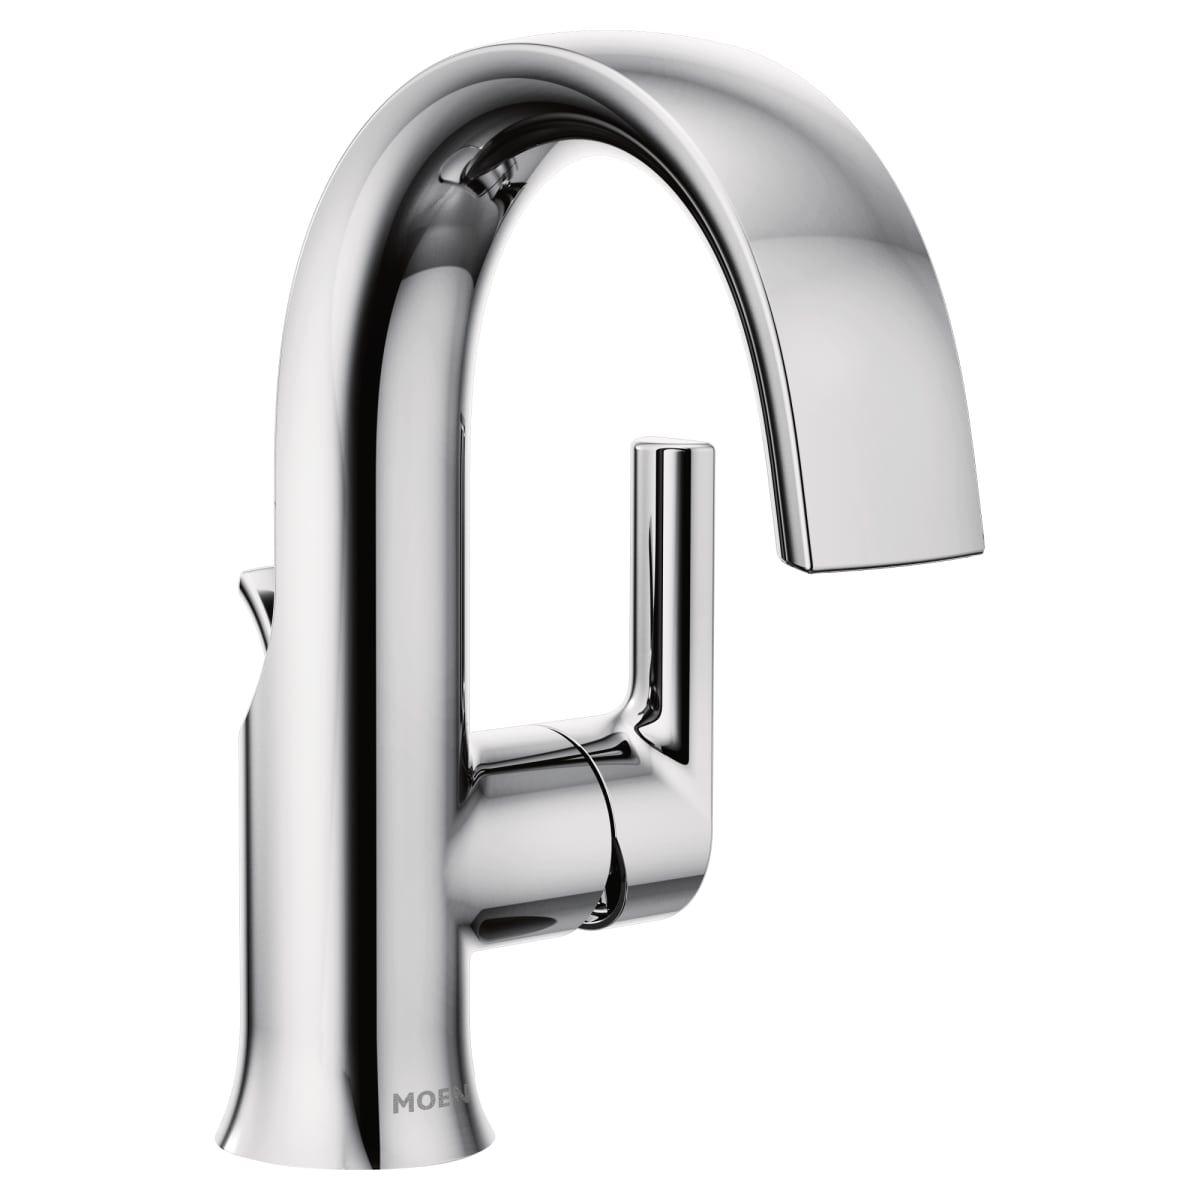 Moen S6910 Chrome Doux 1 2 Gpm Single, Moen Chrome Bathroom Faucet